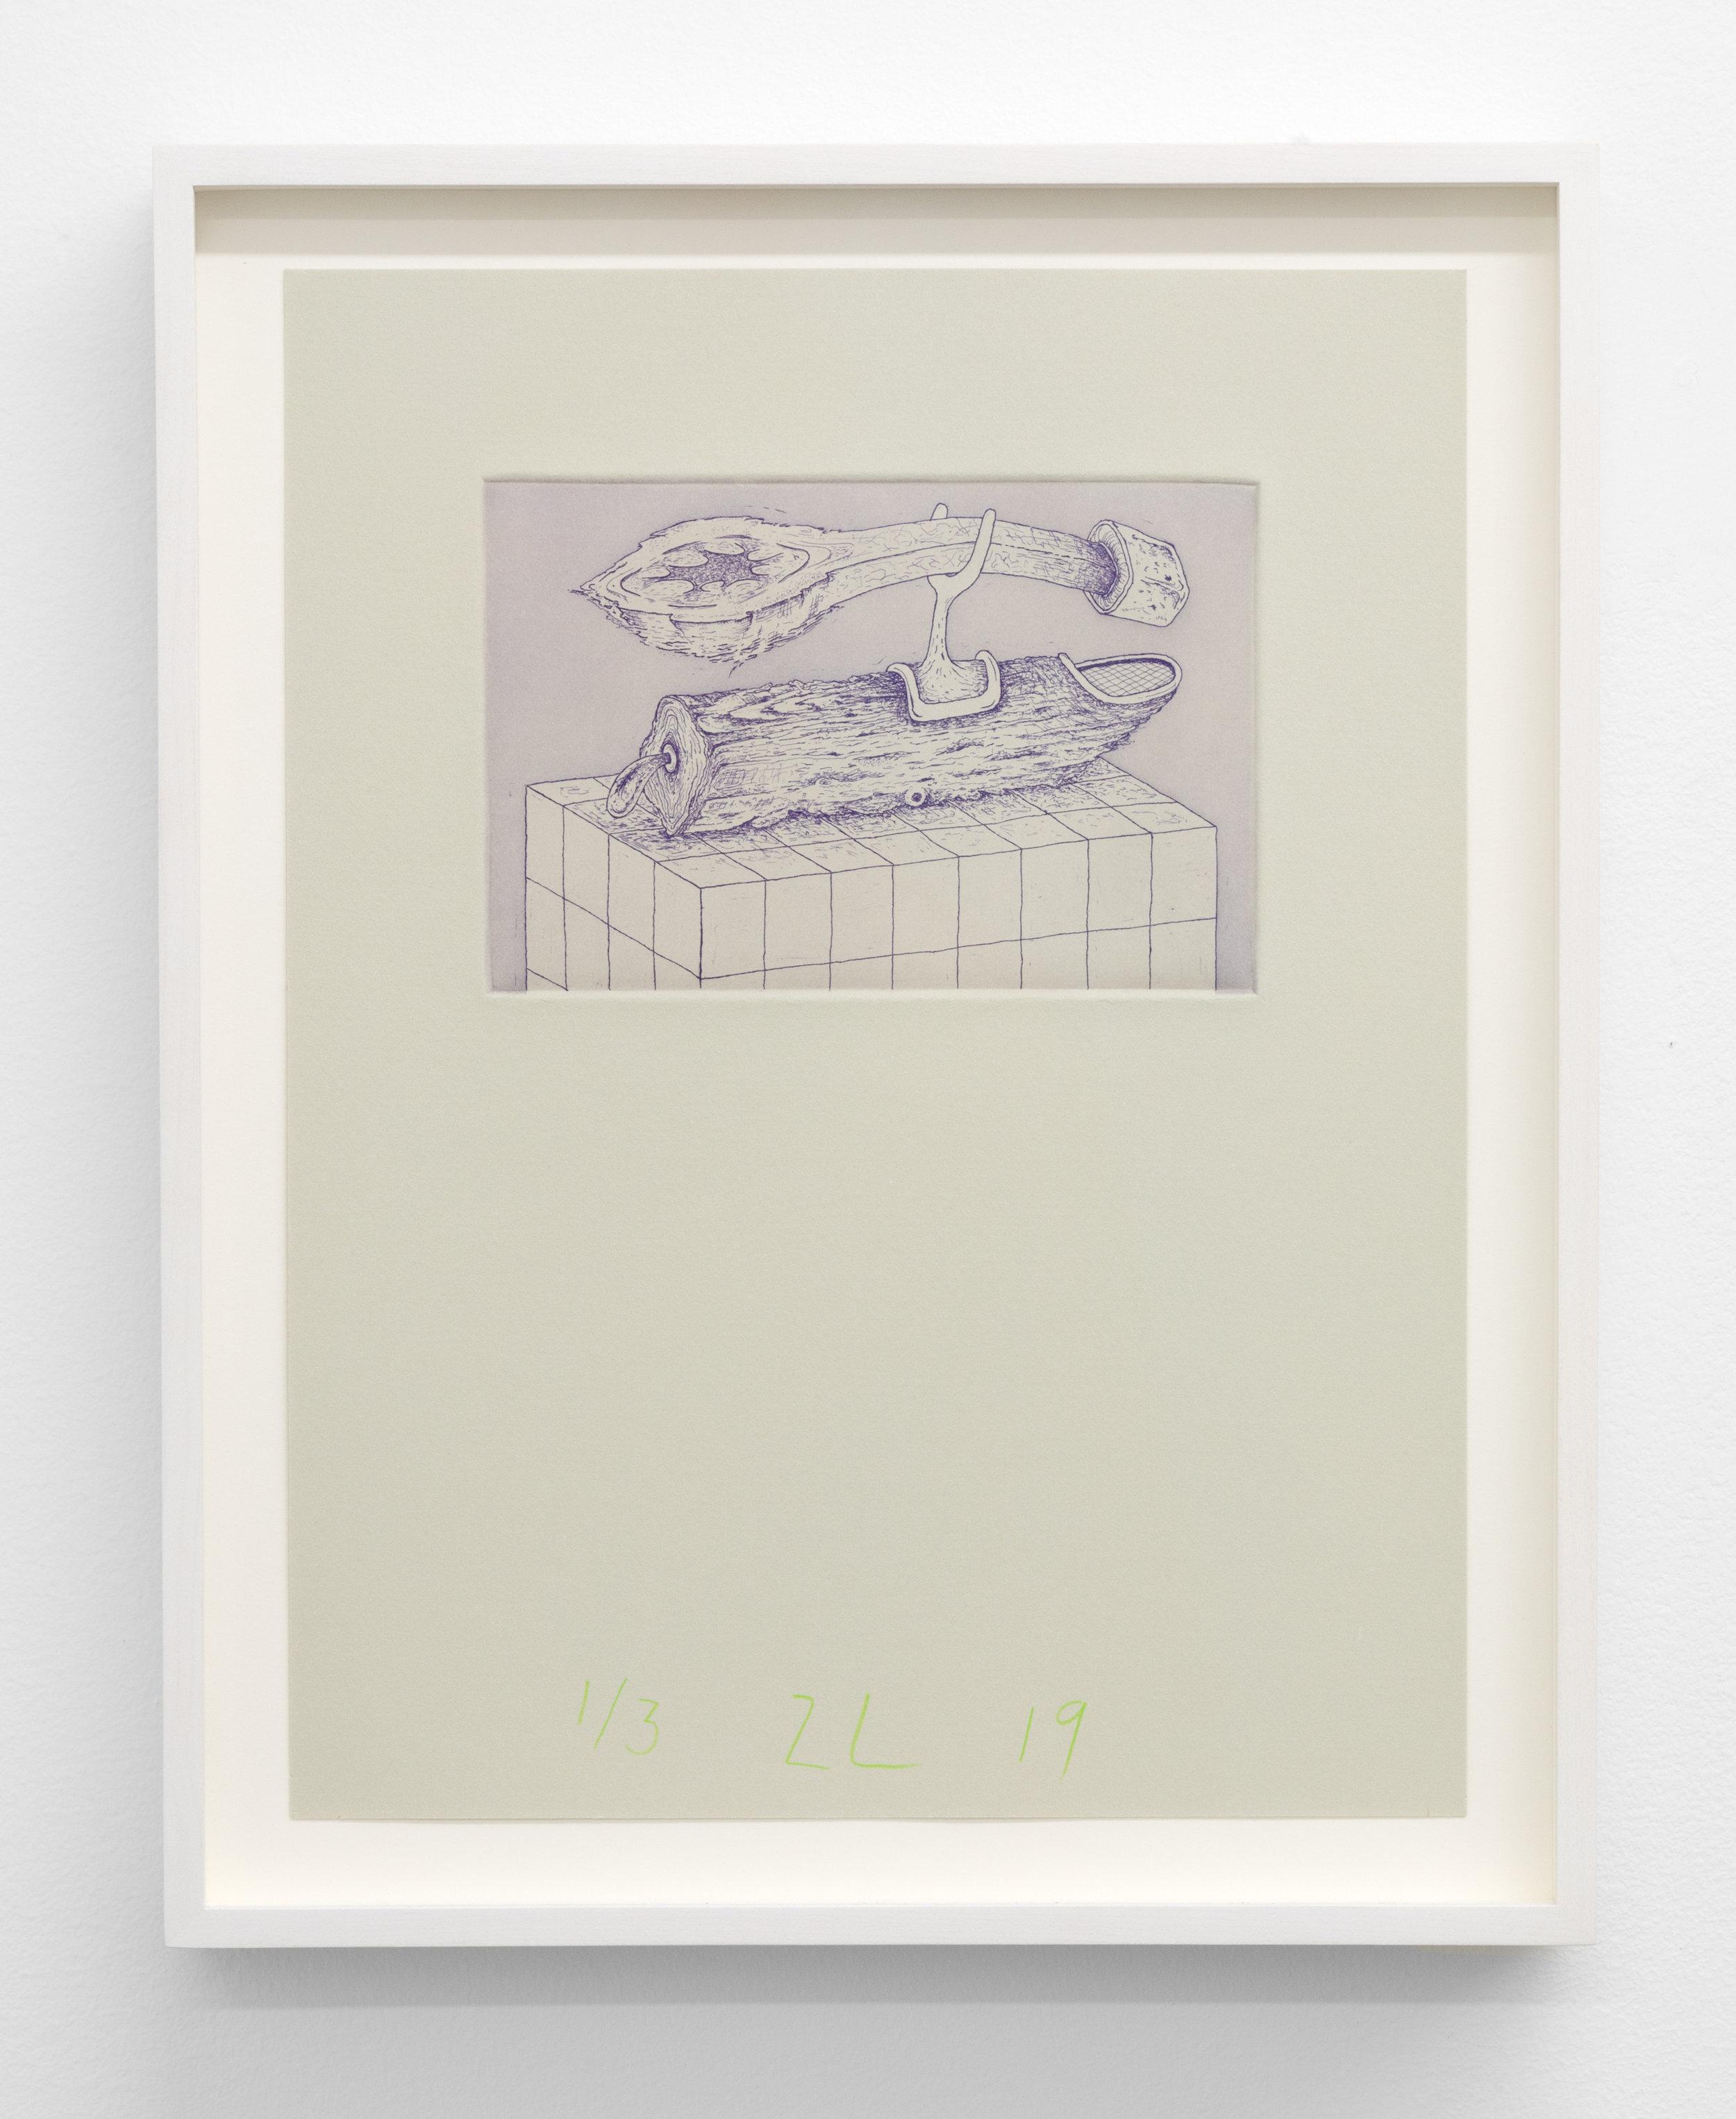 Zachary Leener,  Shekinta (Shekhinah) , 2019 Edition of 3 + 1 AP, Etching and aquatint, ink on paper 6 x 4 in